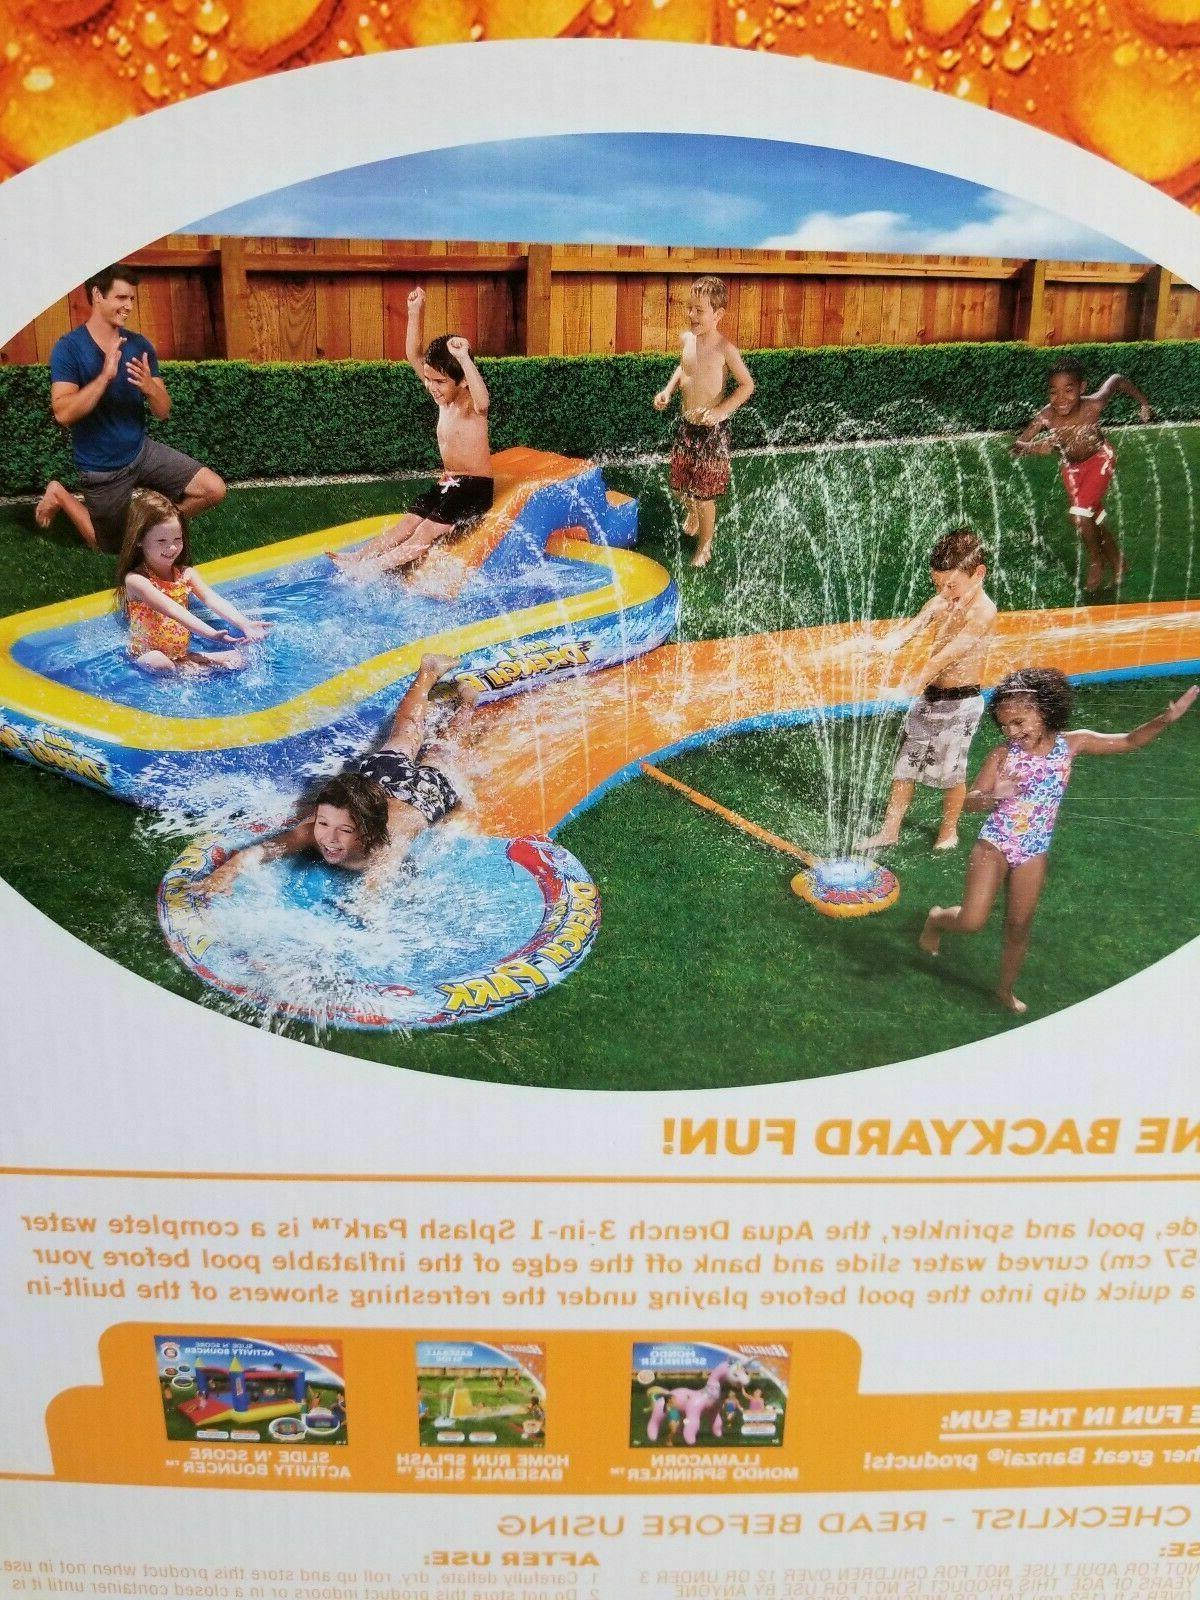 New Banzai Aqua Water Drench w/ Inflatable Pool